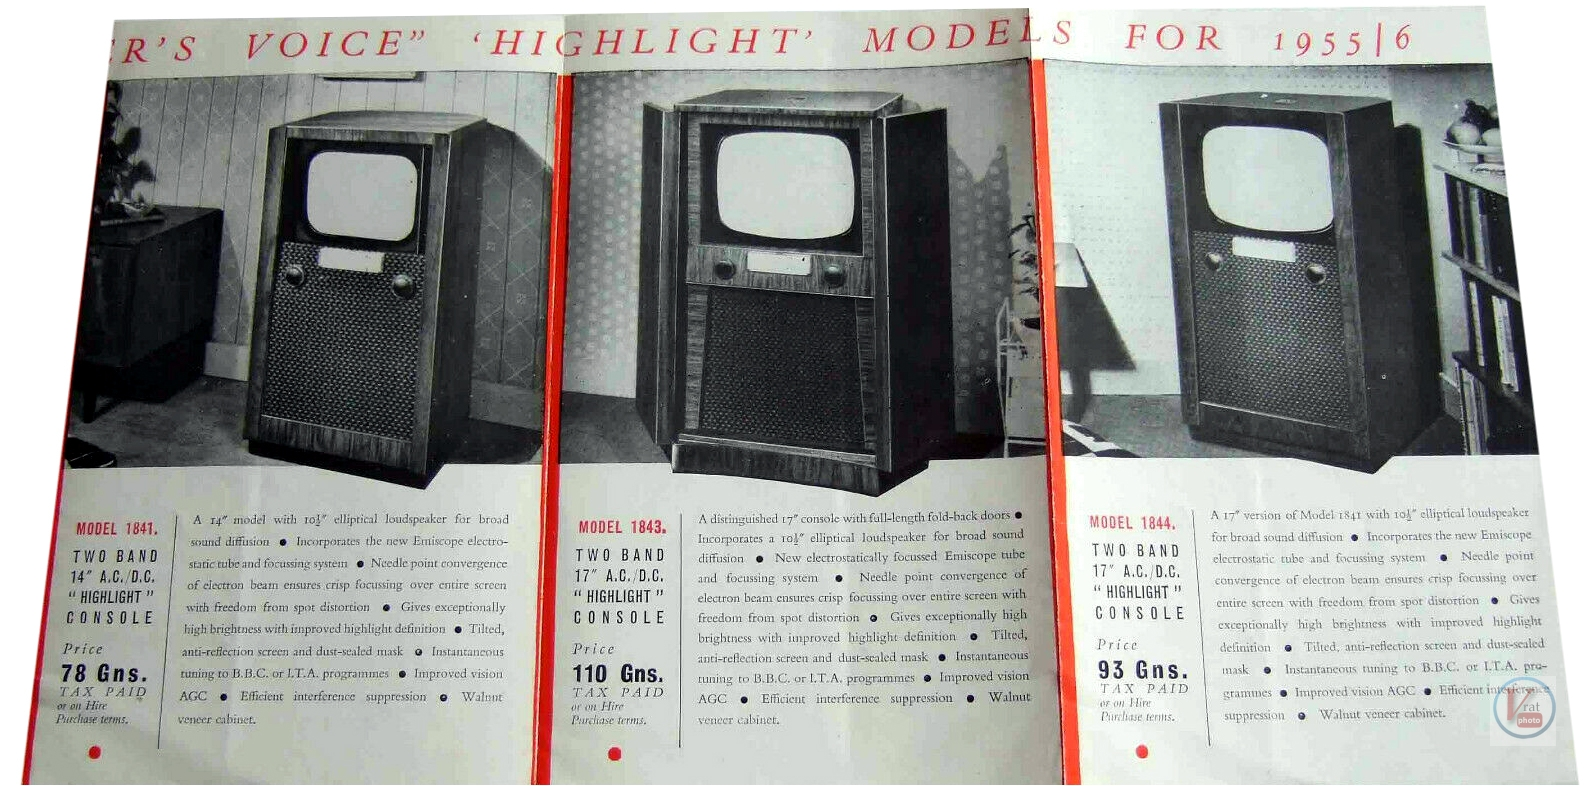 HMV B&W TV's 63